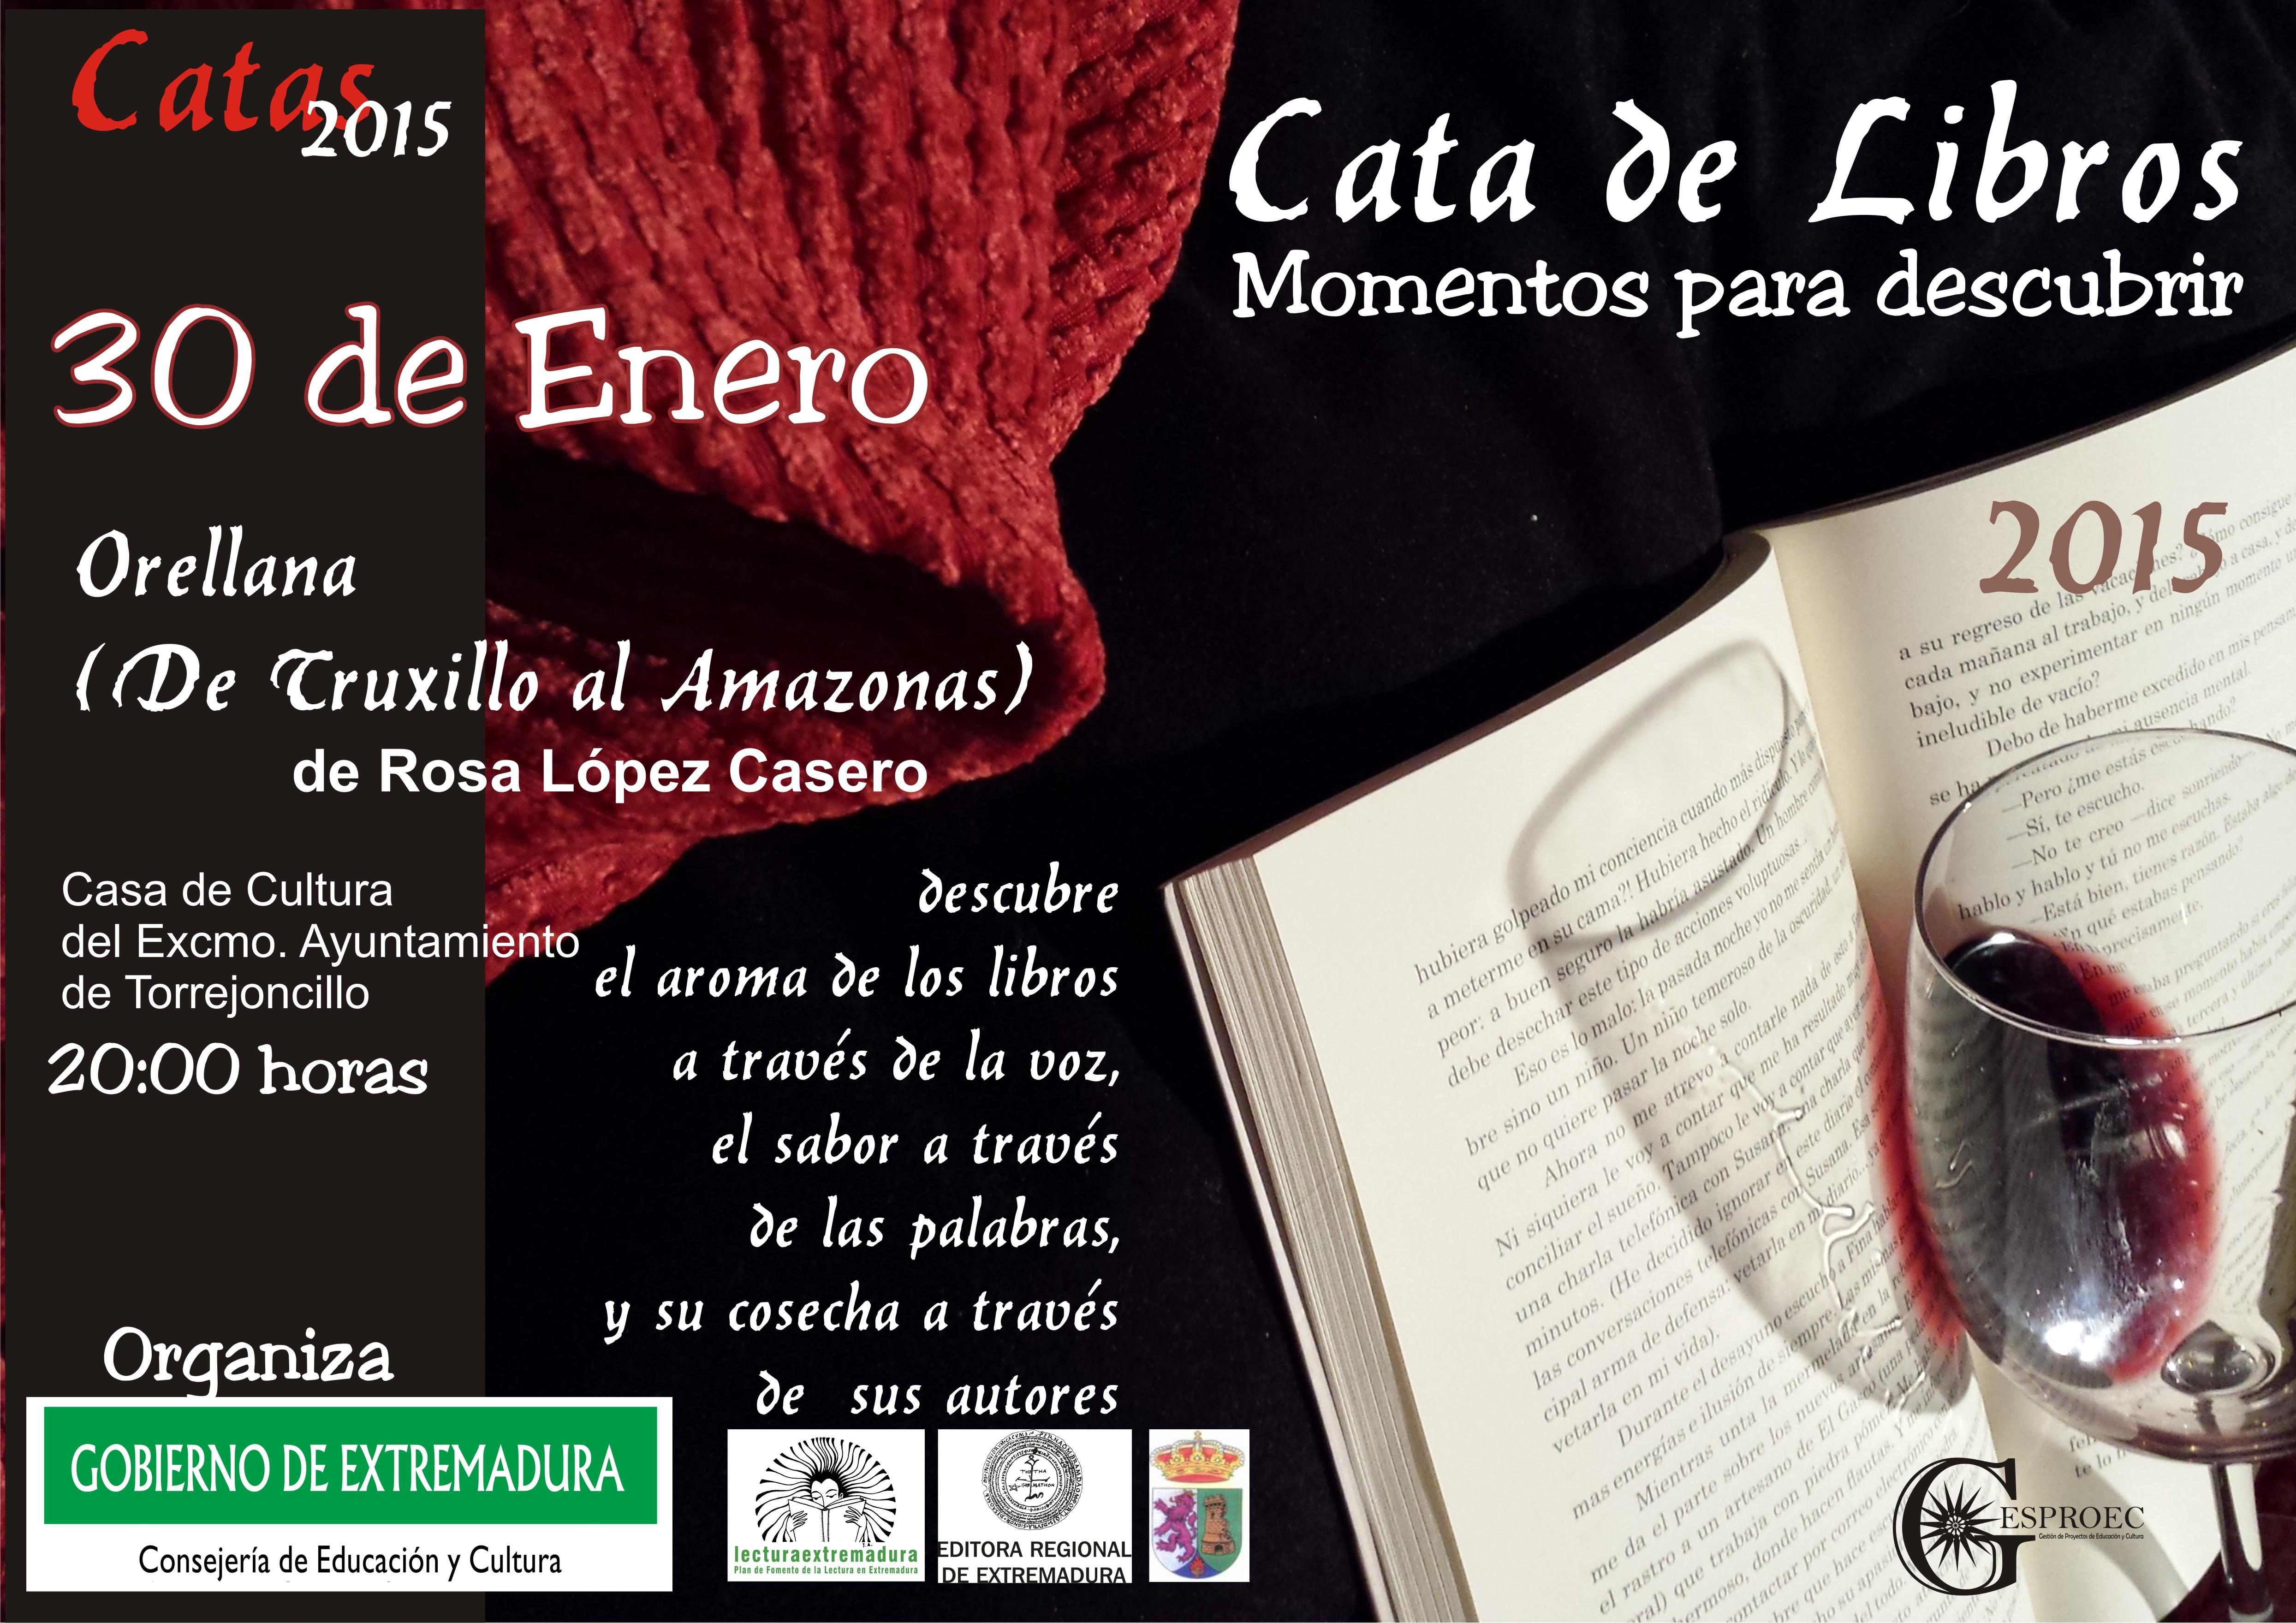 Teatro  «Cata de Libros», Orellana (de Truxillos al Amazonas)